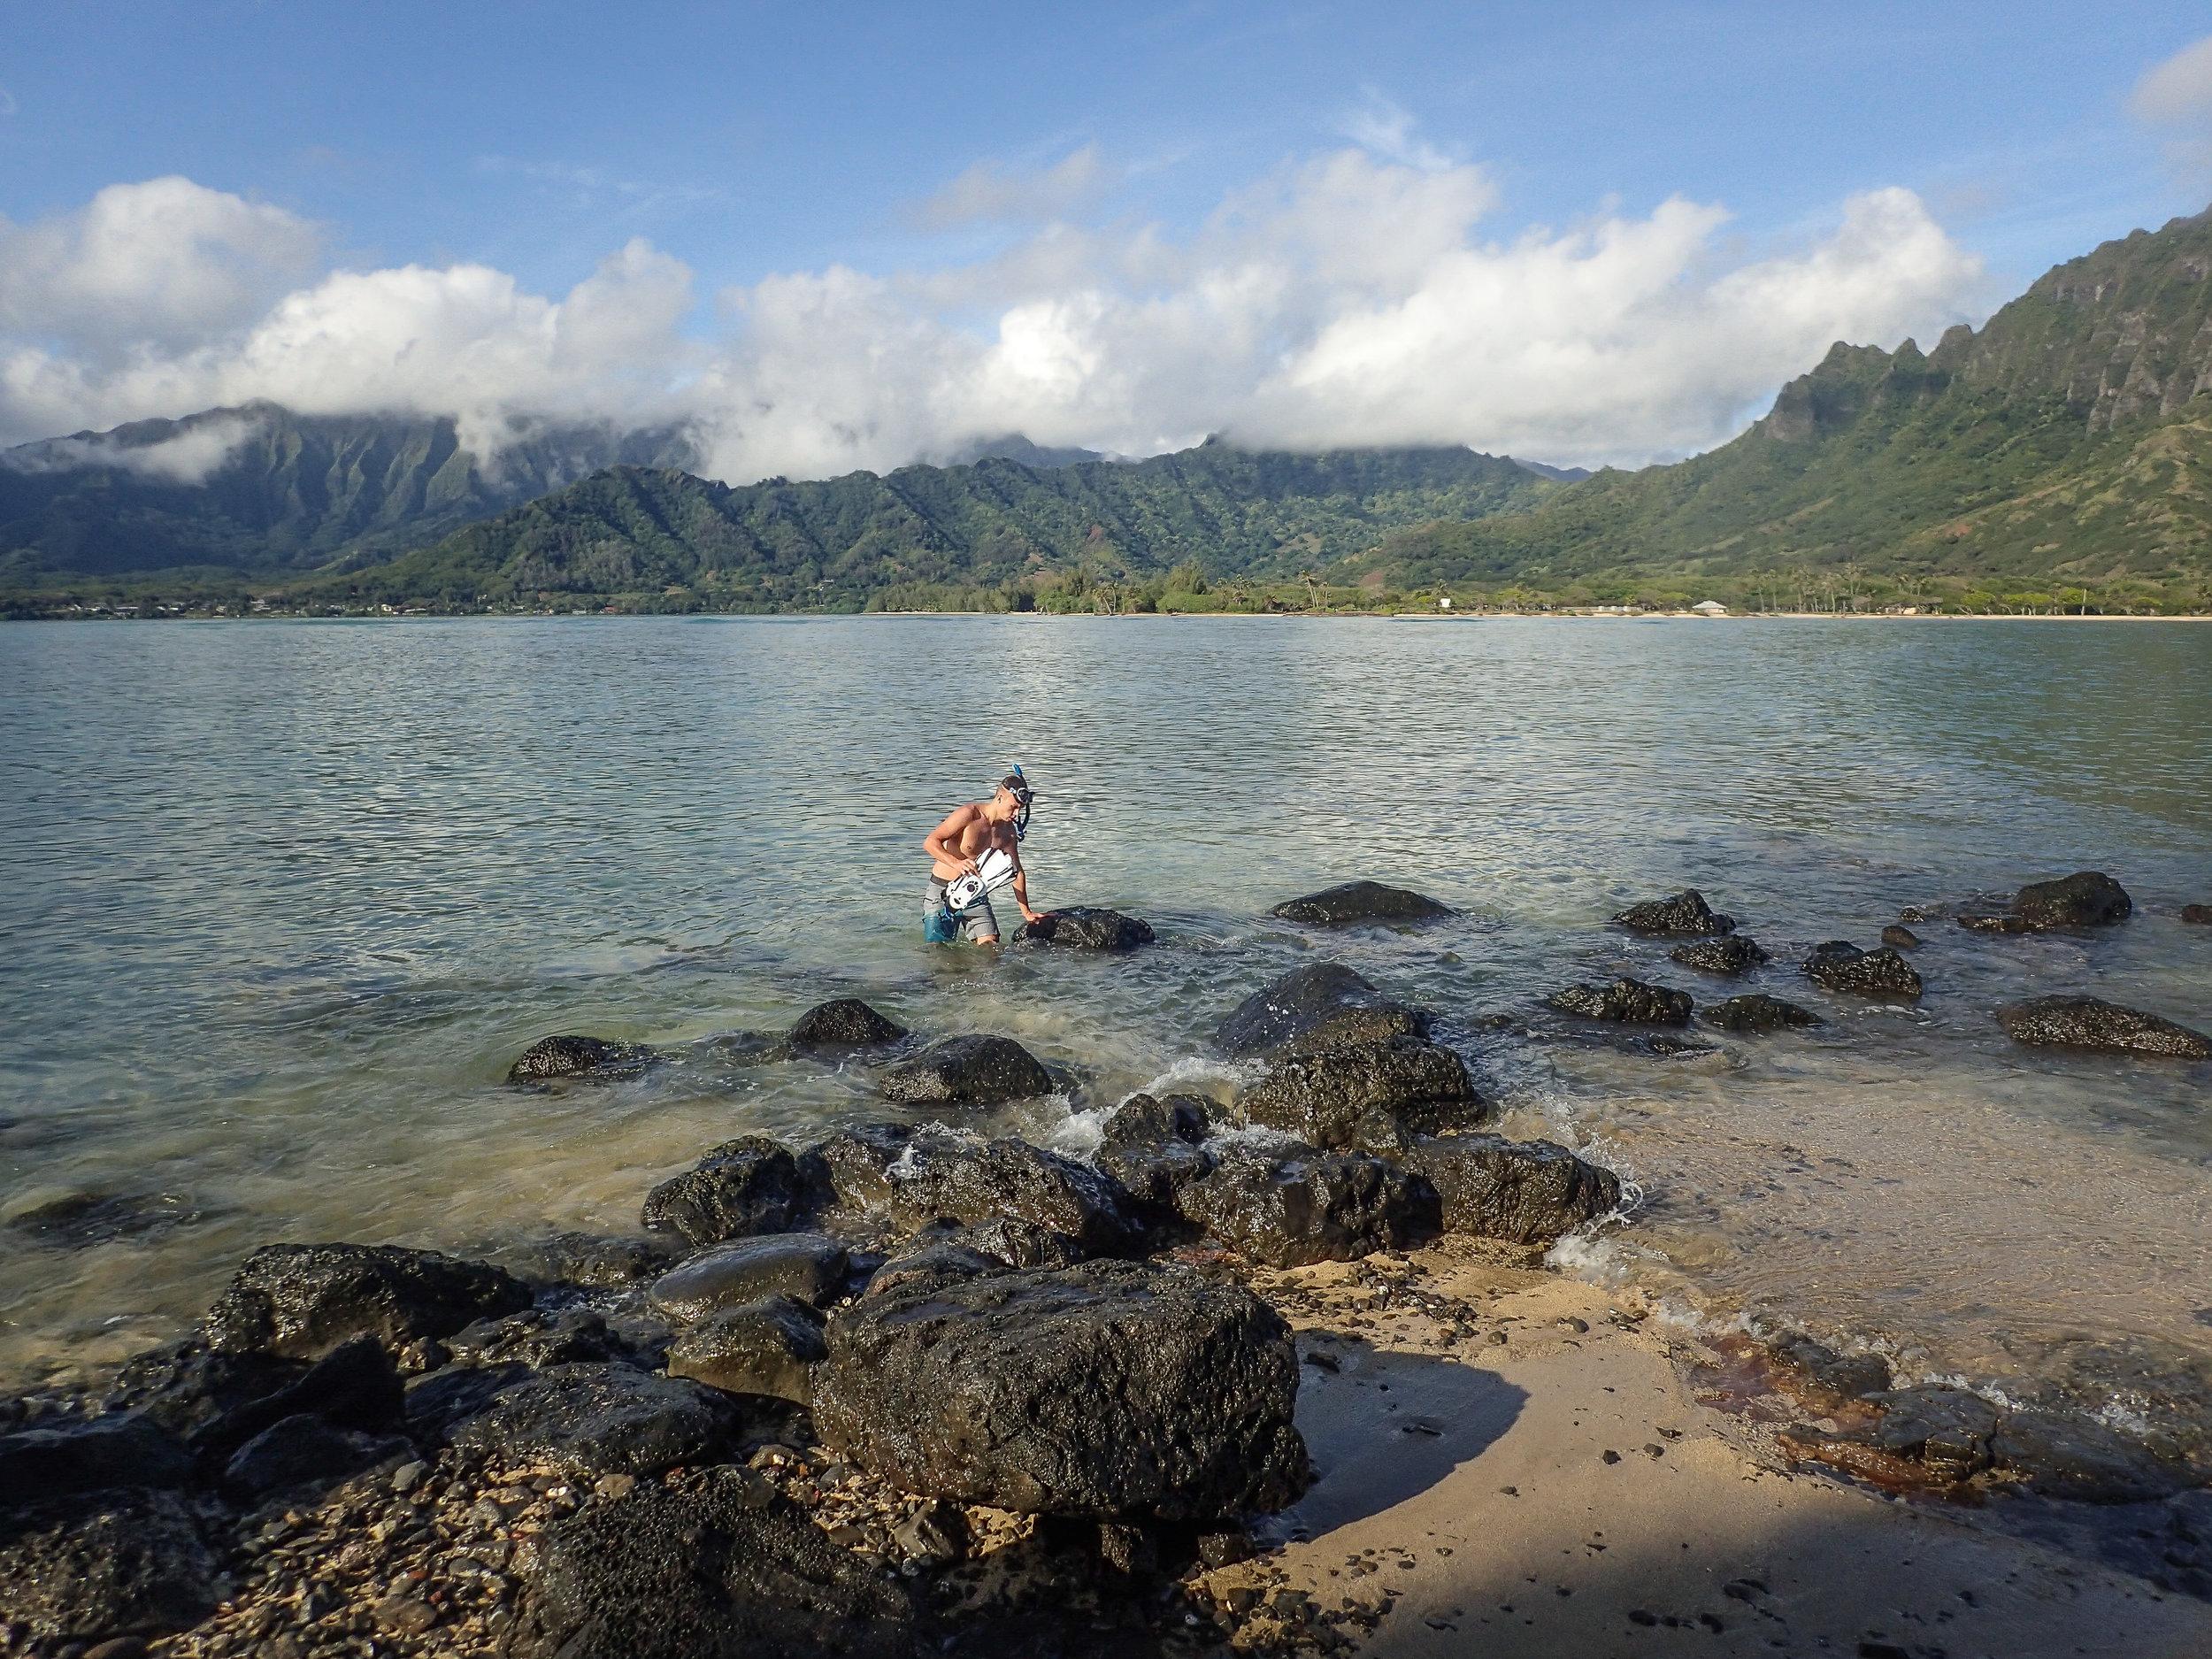 P_Tr_HI_Oahu_Olympus Images-235.jpg